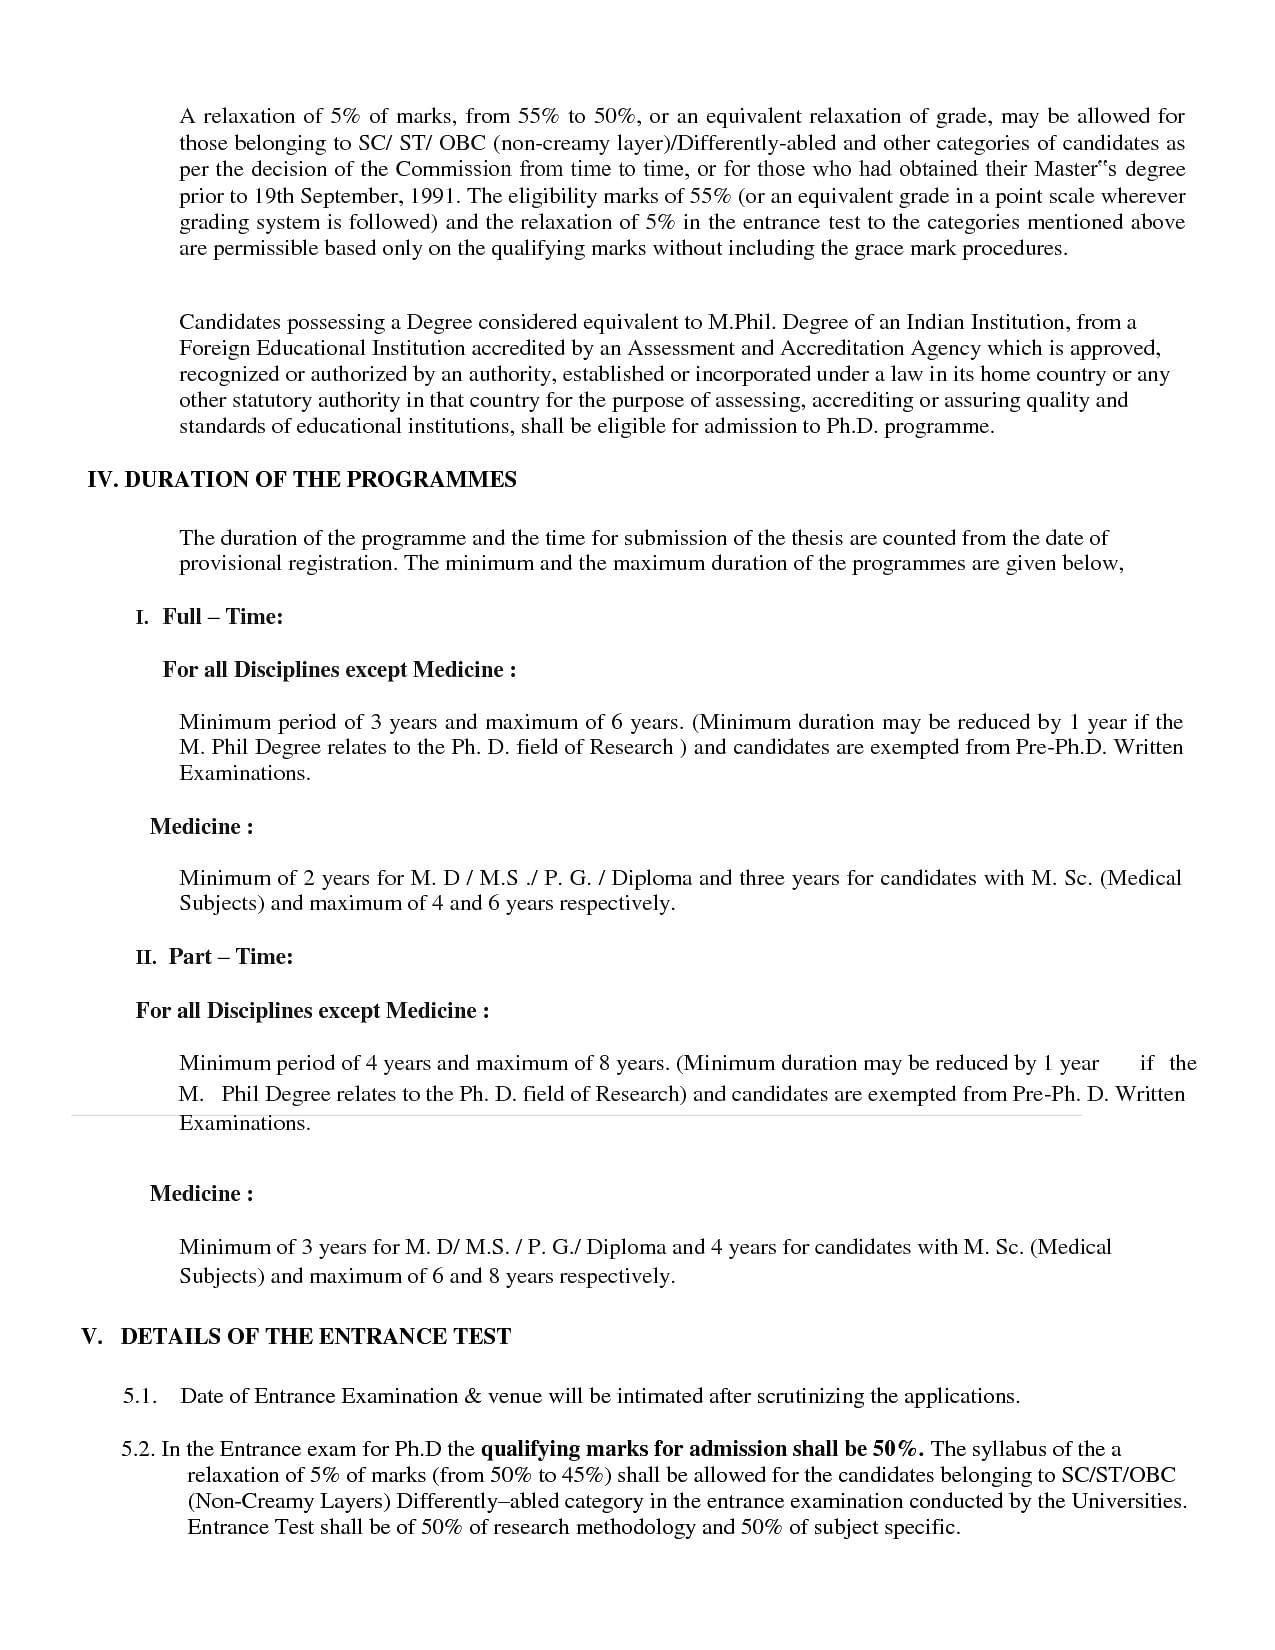 Vinayaka mission university - Courses, Admission, Fees